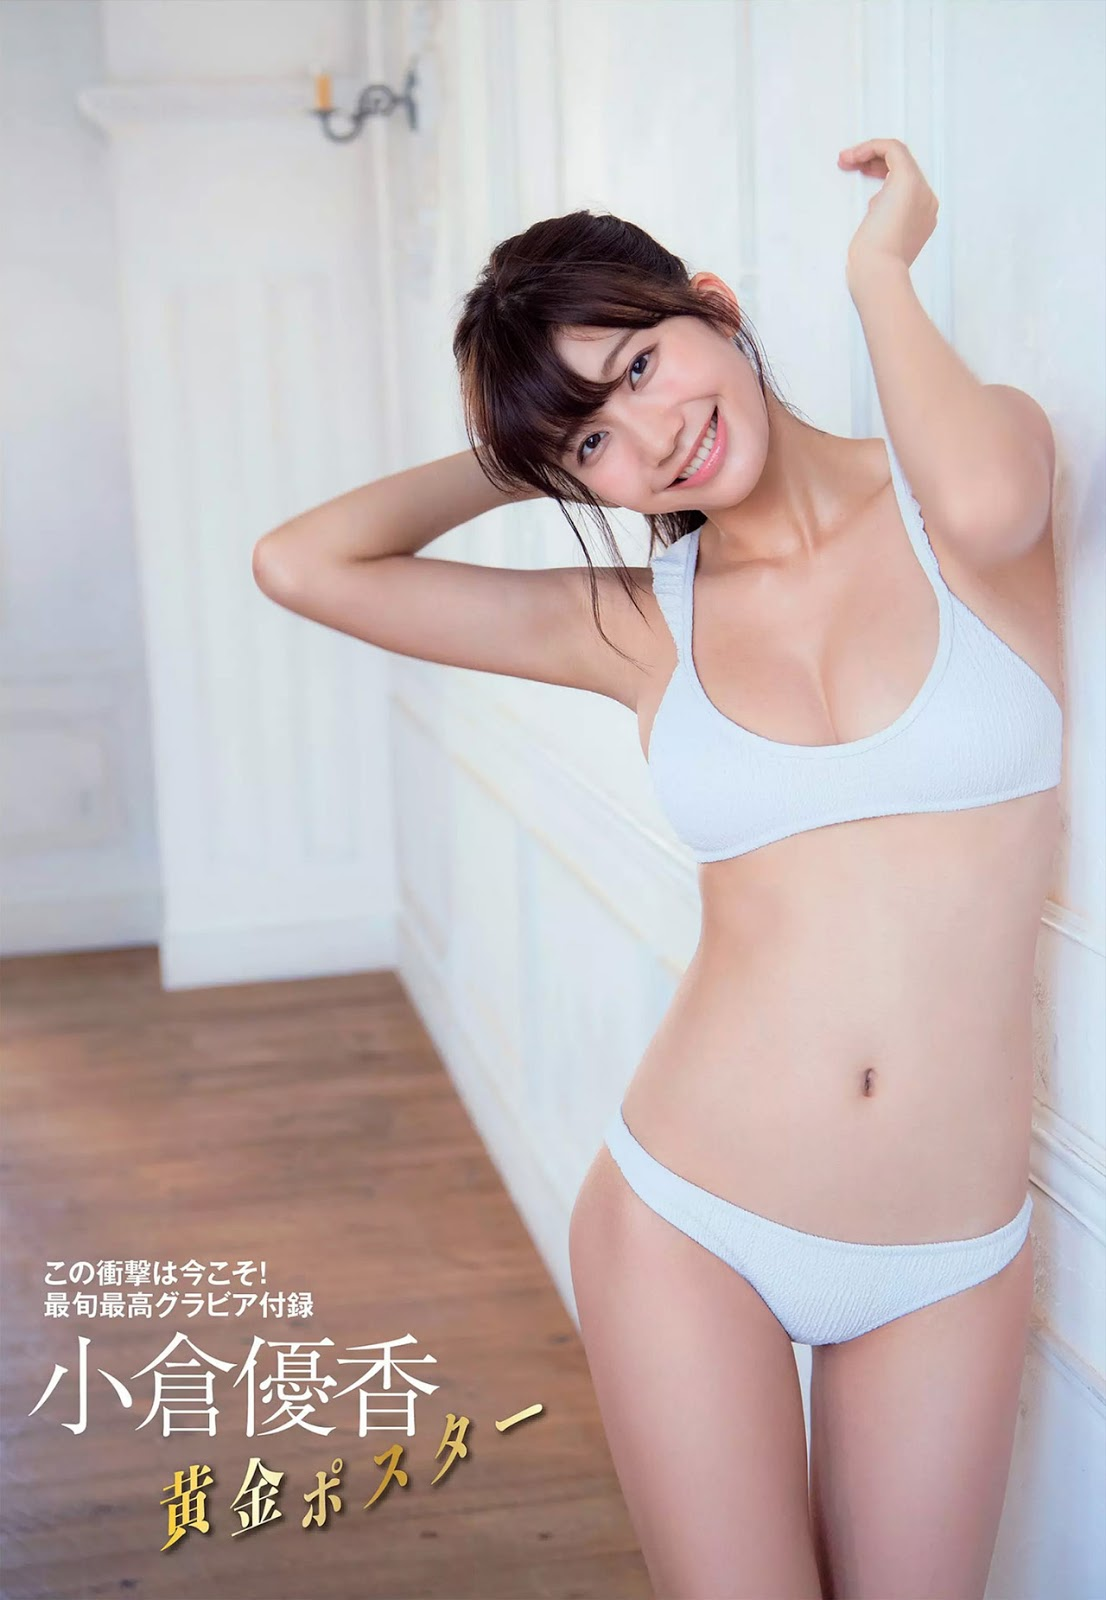 Yuka Ogura 小倉優香, FLASH 電子版 2018.01.02 Part.02 (フラッシュ 2018年01月02日号)